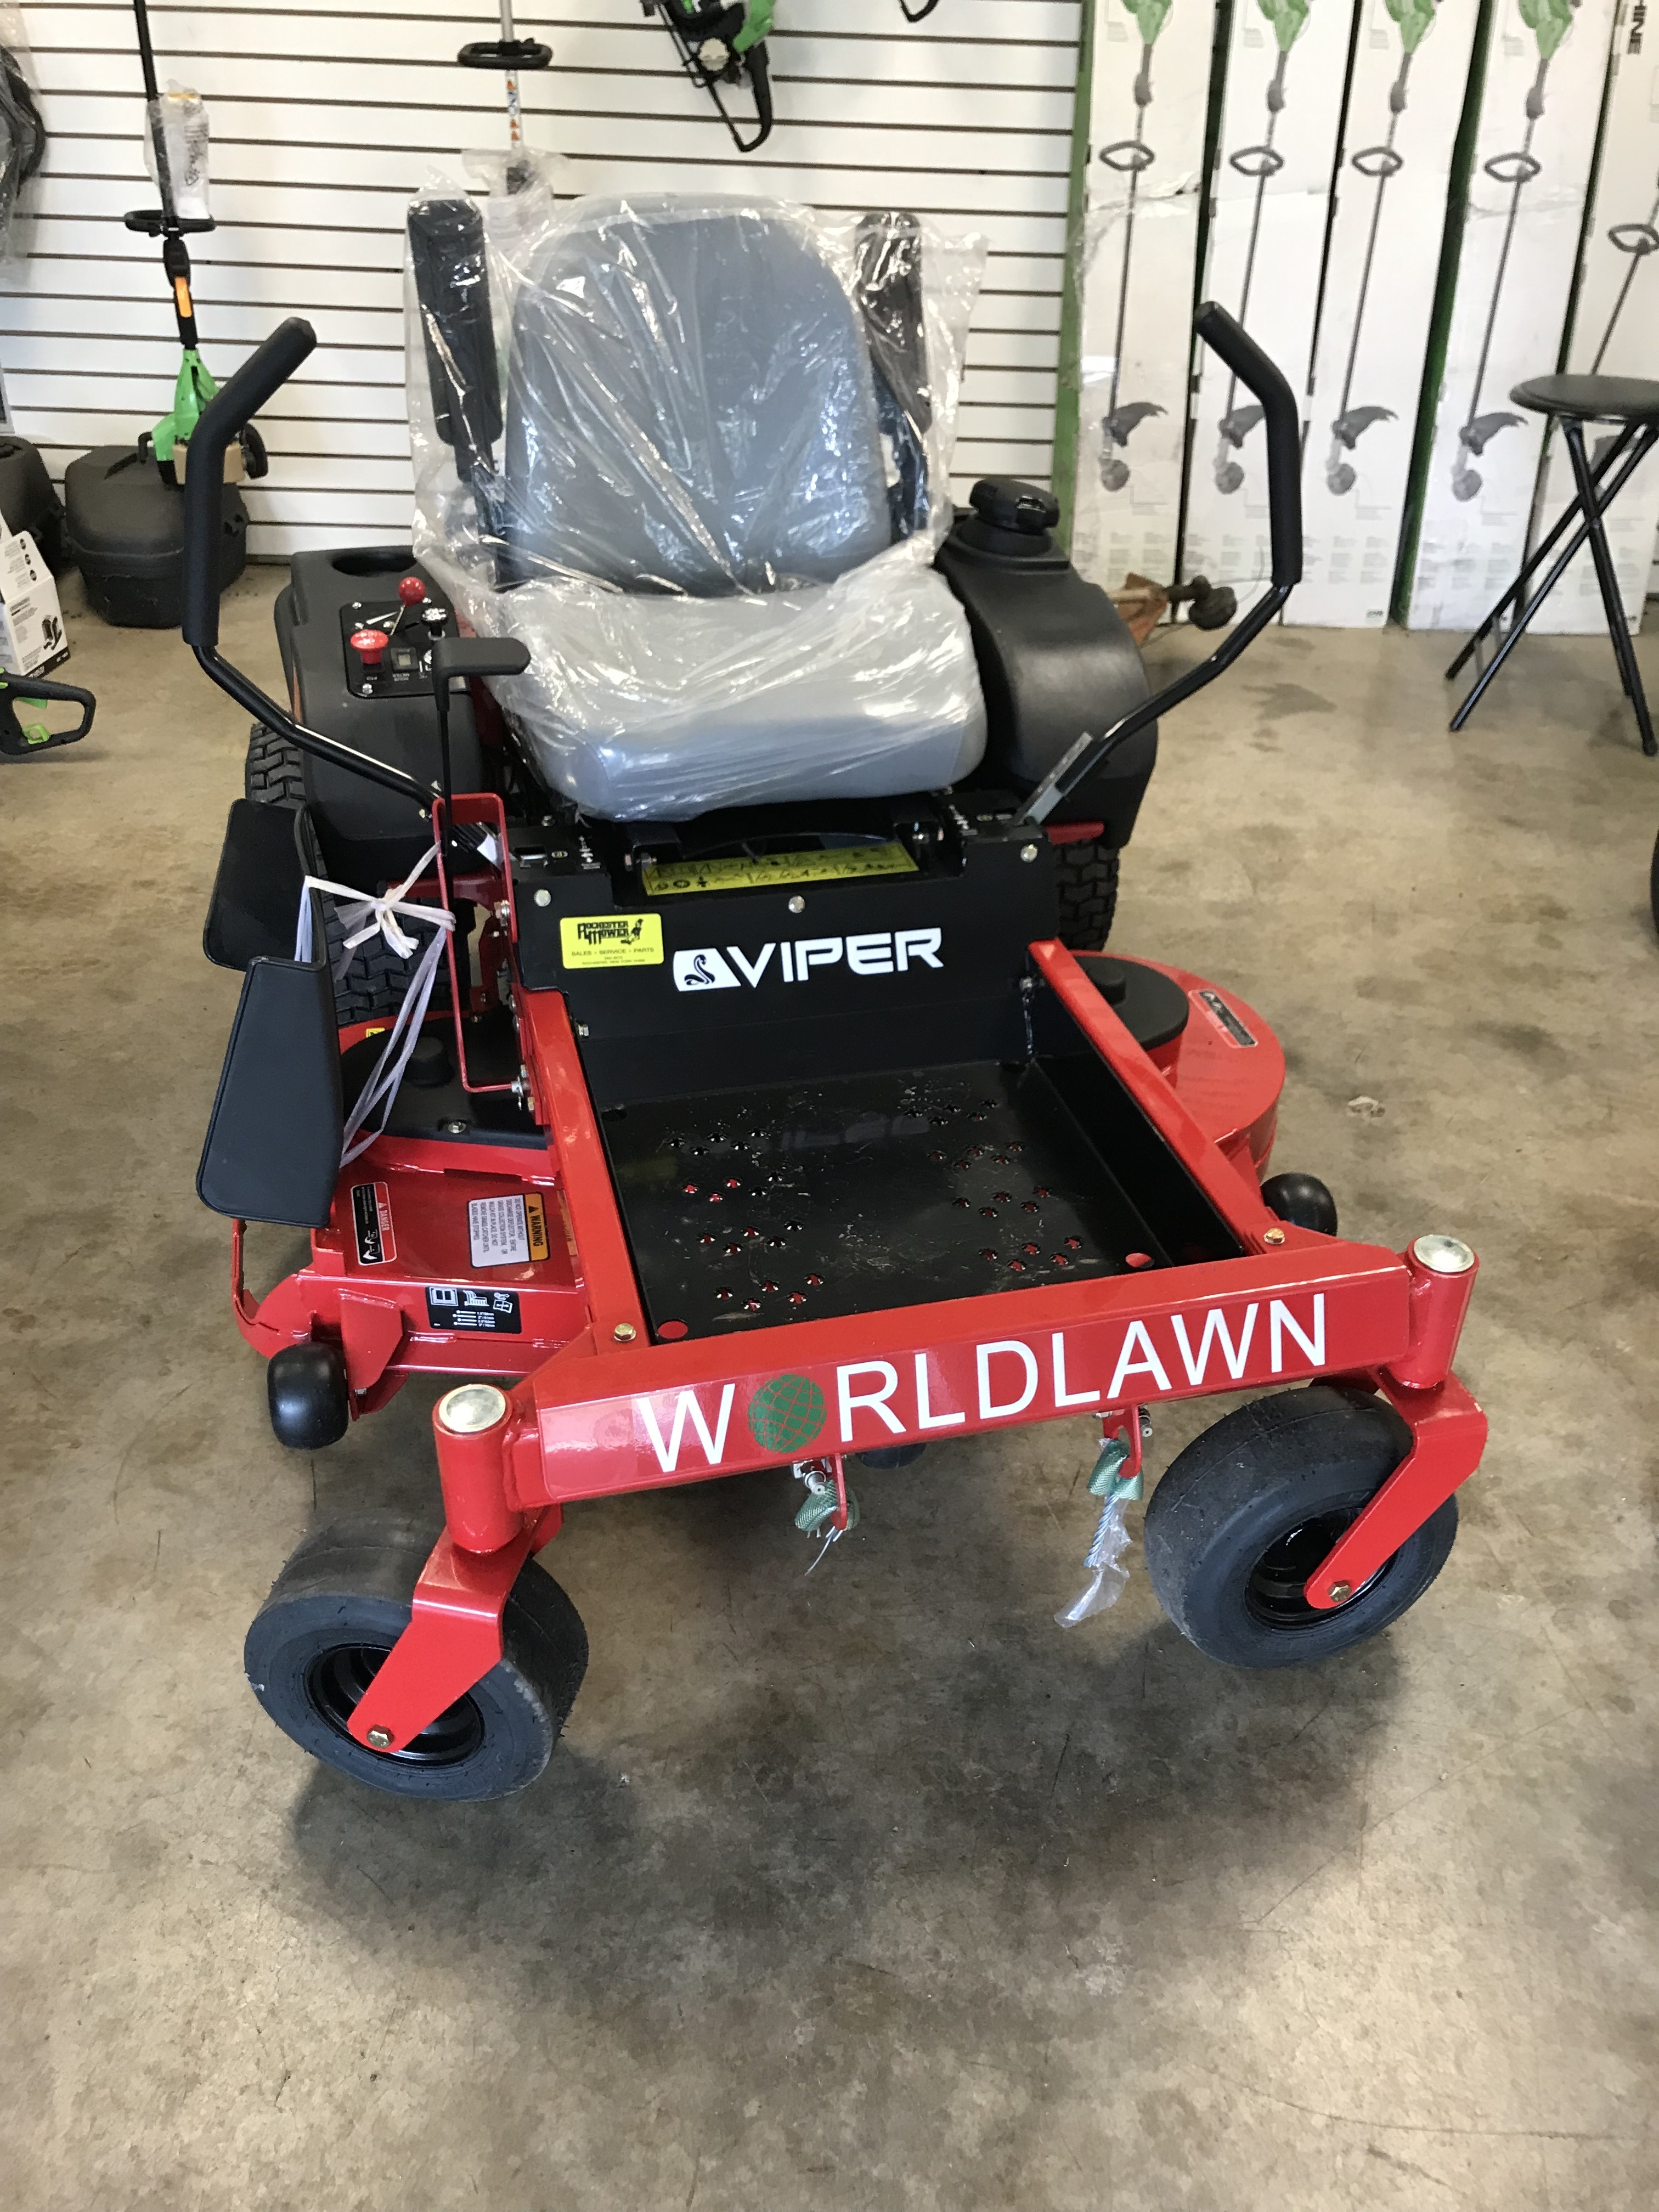 World Lawn Mower